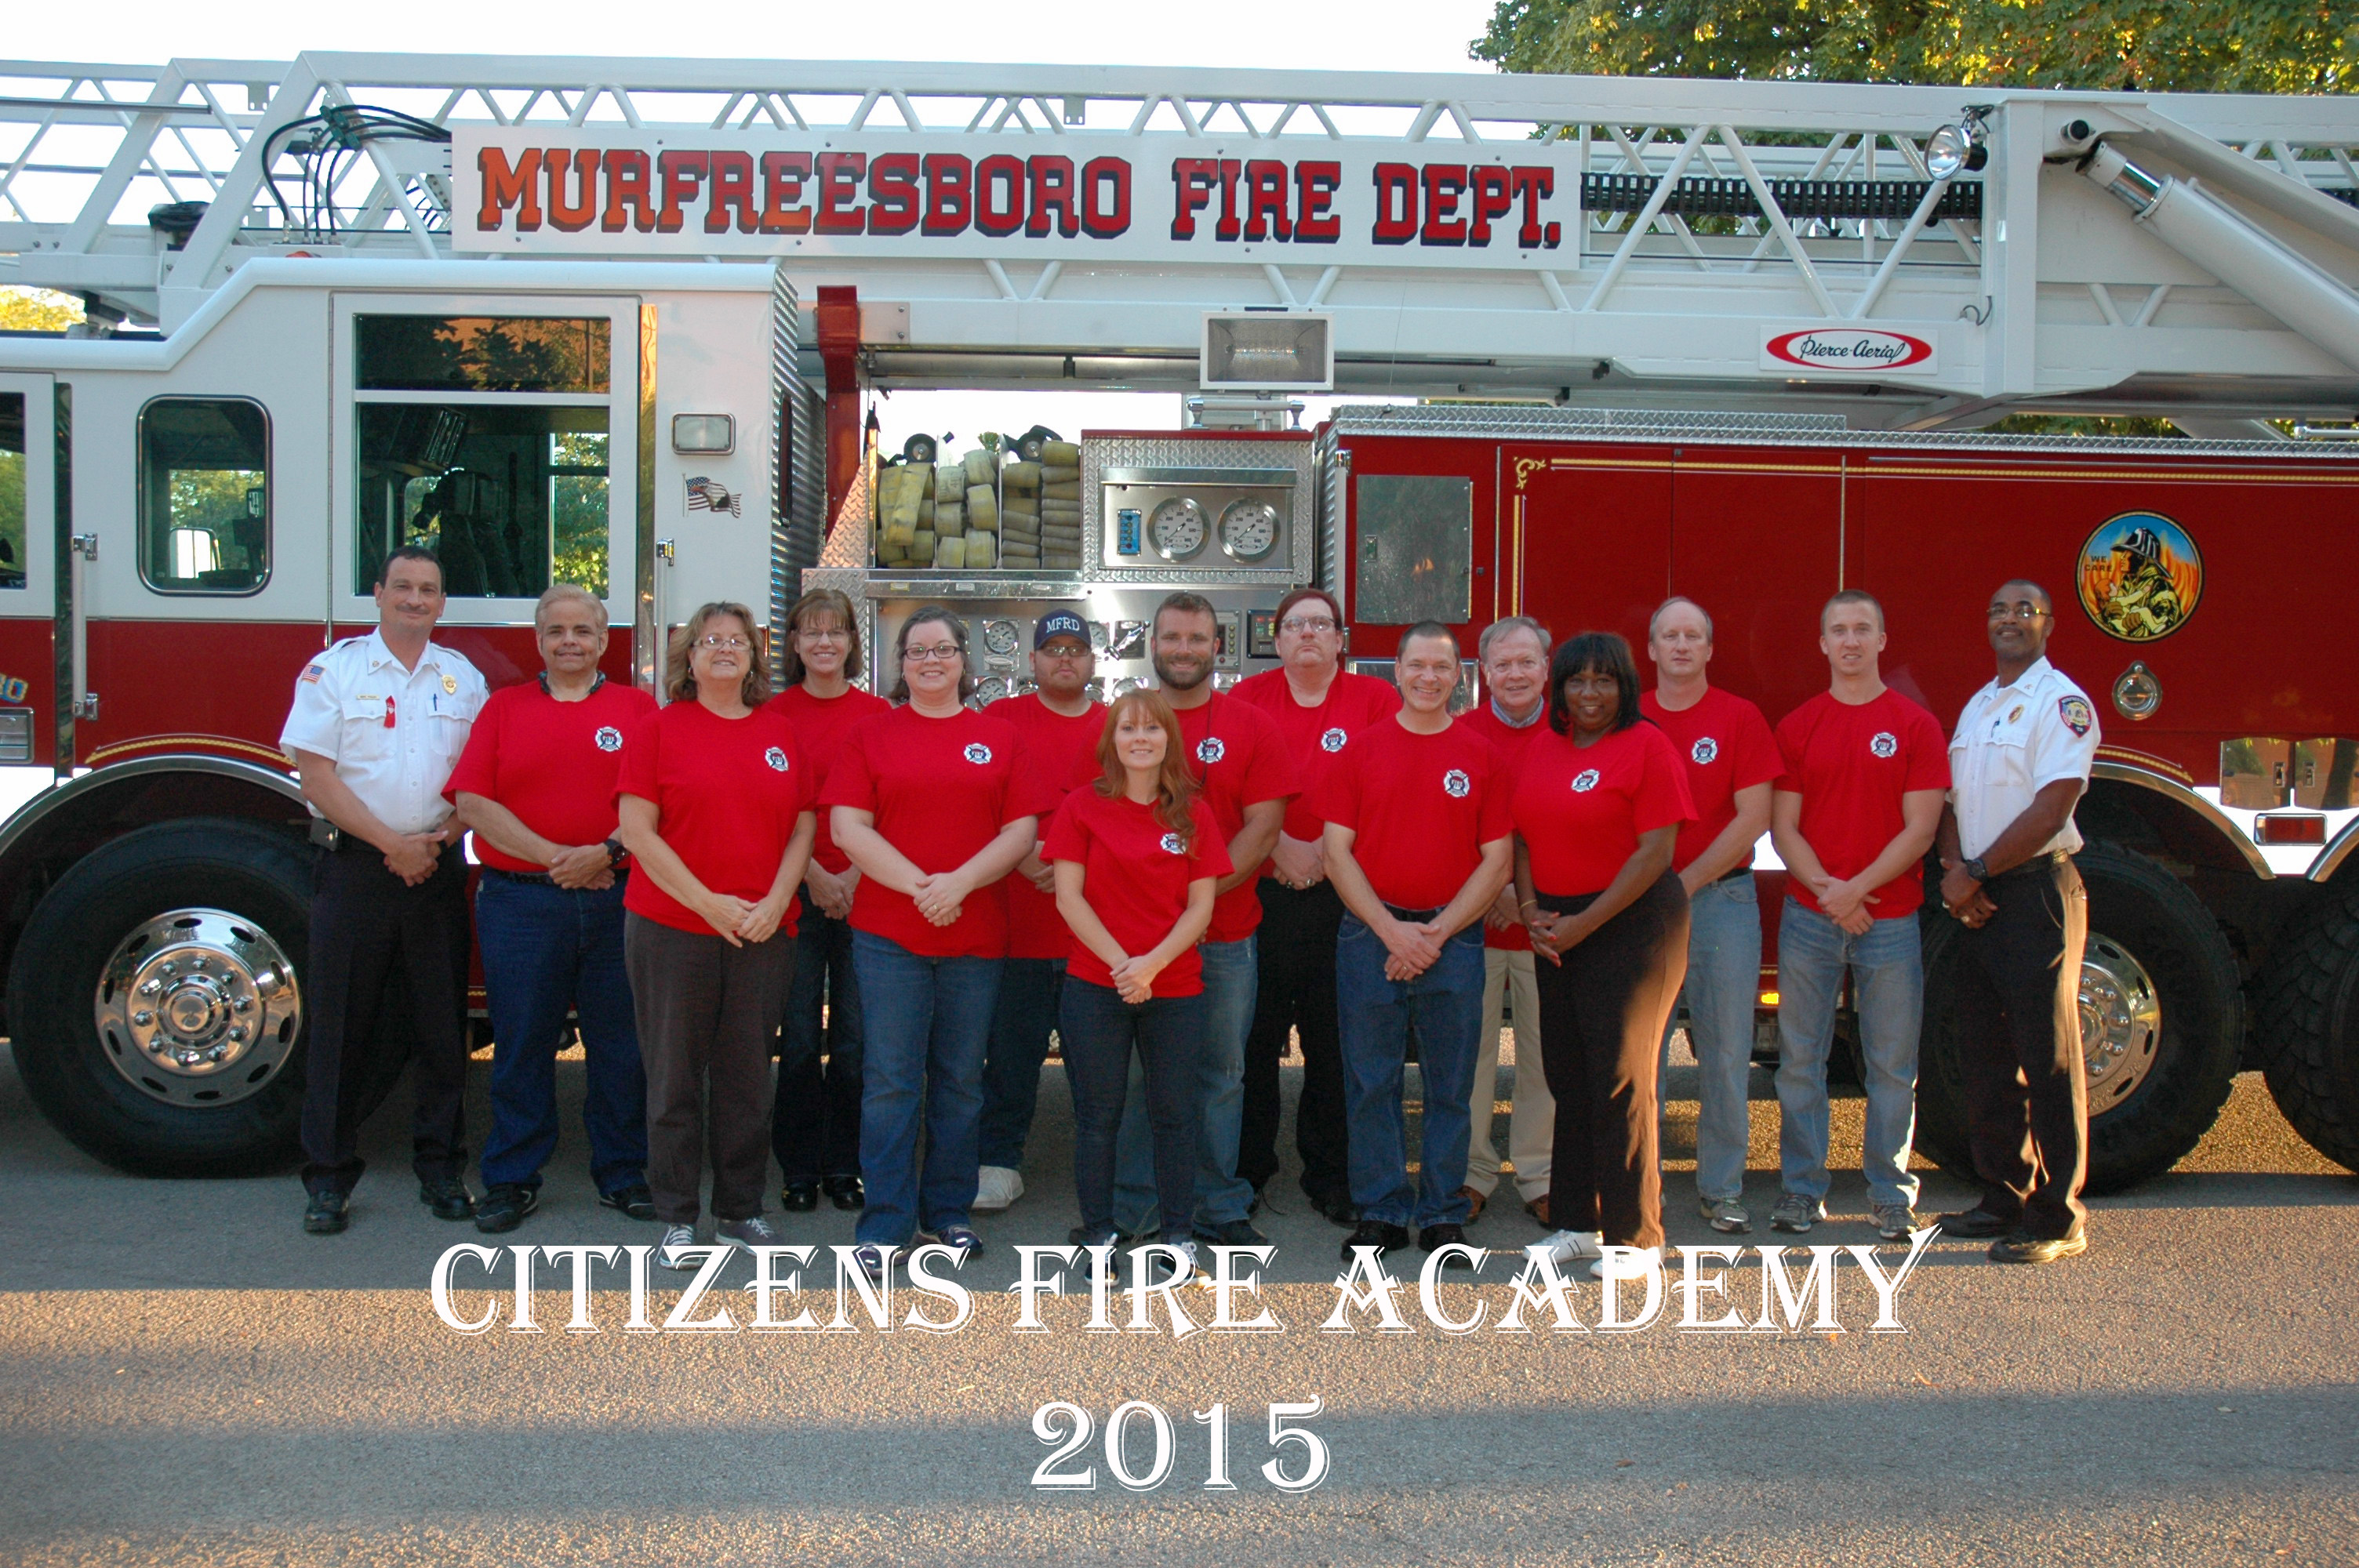 Murfreesboro Fire News And Radio Wildfire Engine Wiring Diagram Thirteen Graduate From Mfrds Citizens Academy